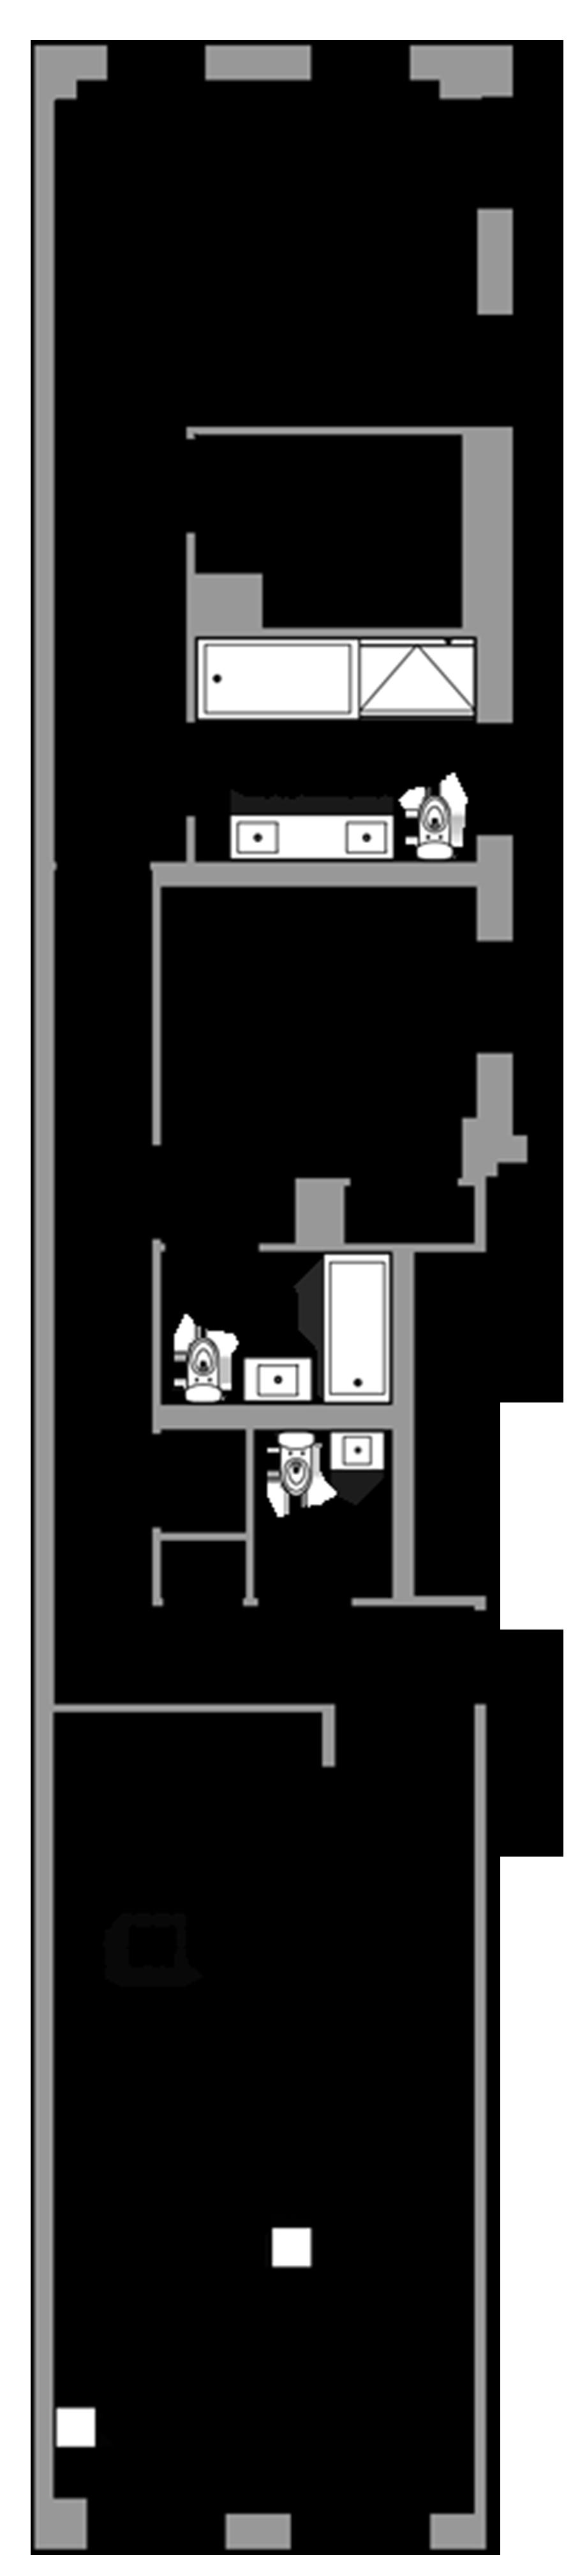 Residence 901